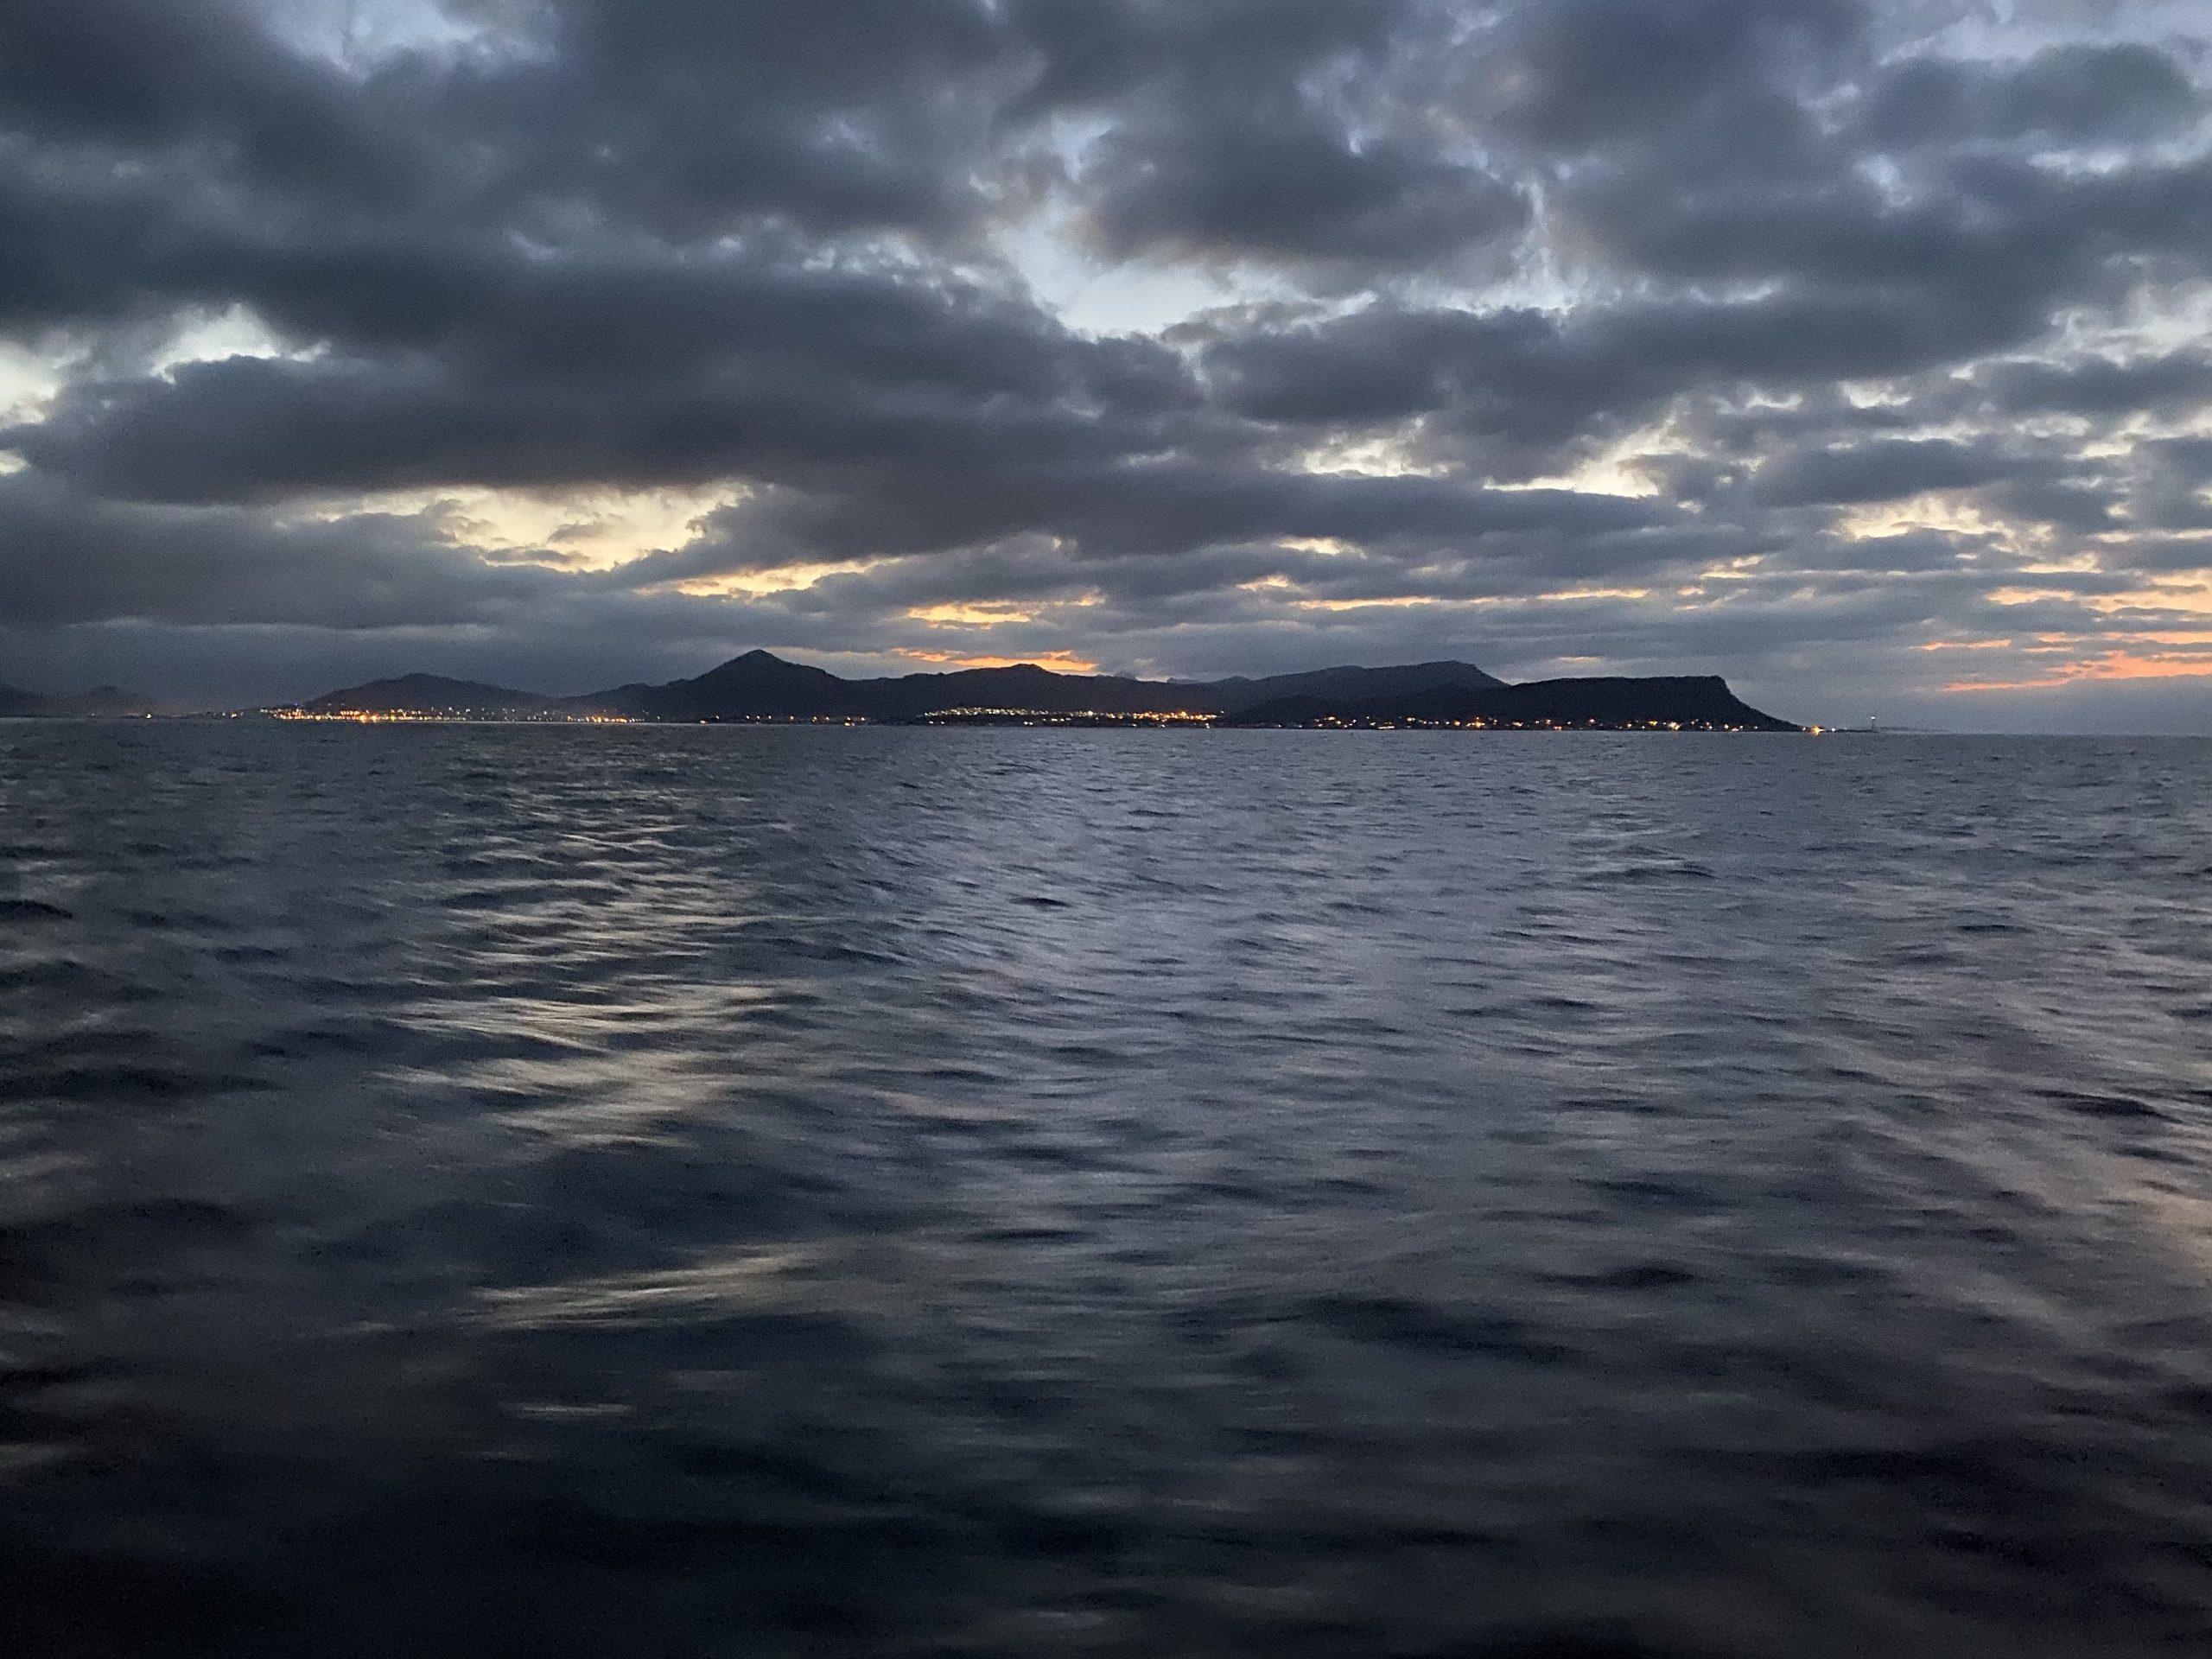 Second Night at Sea